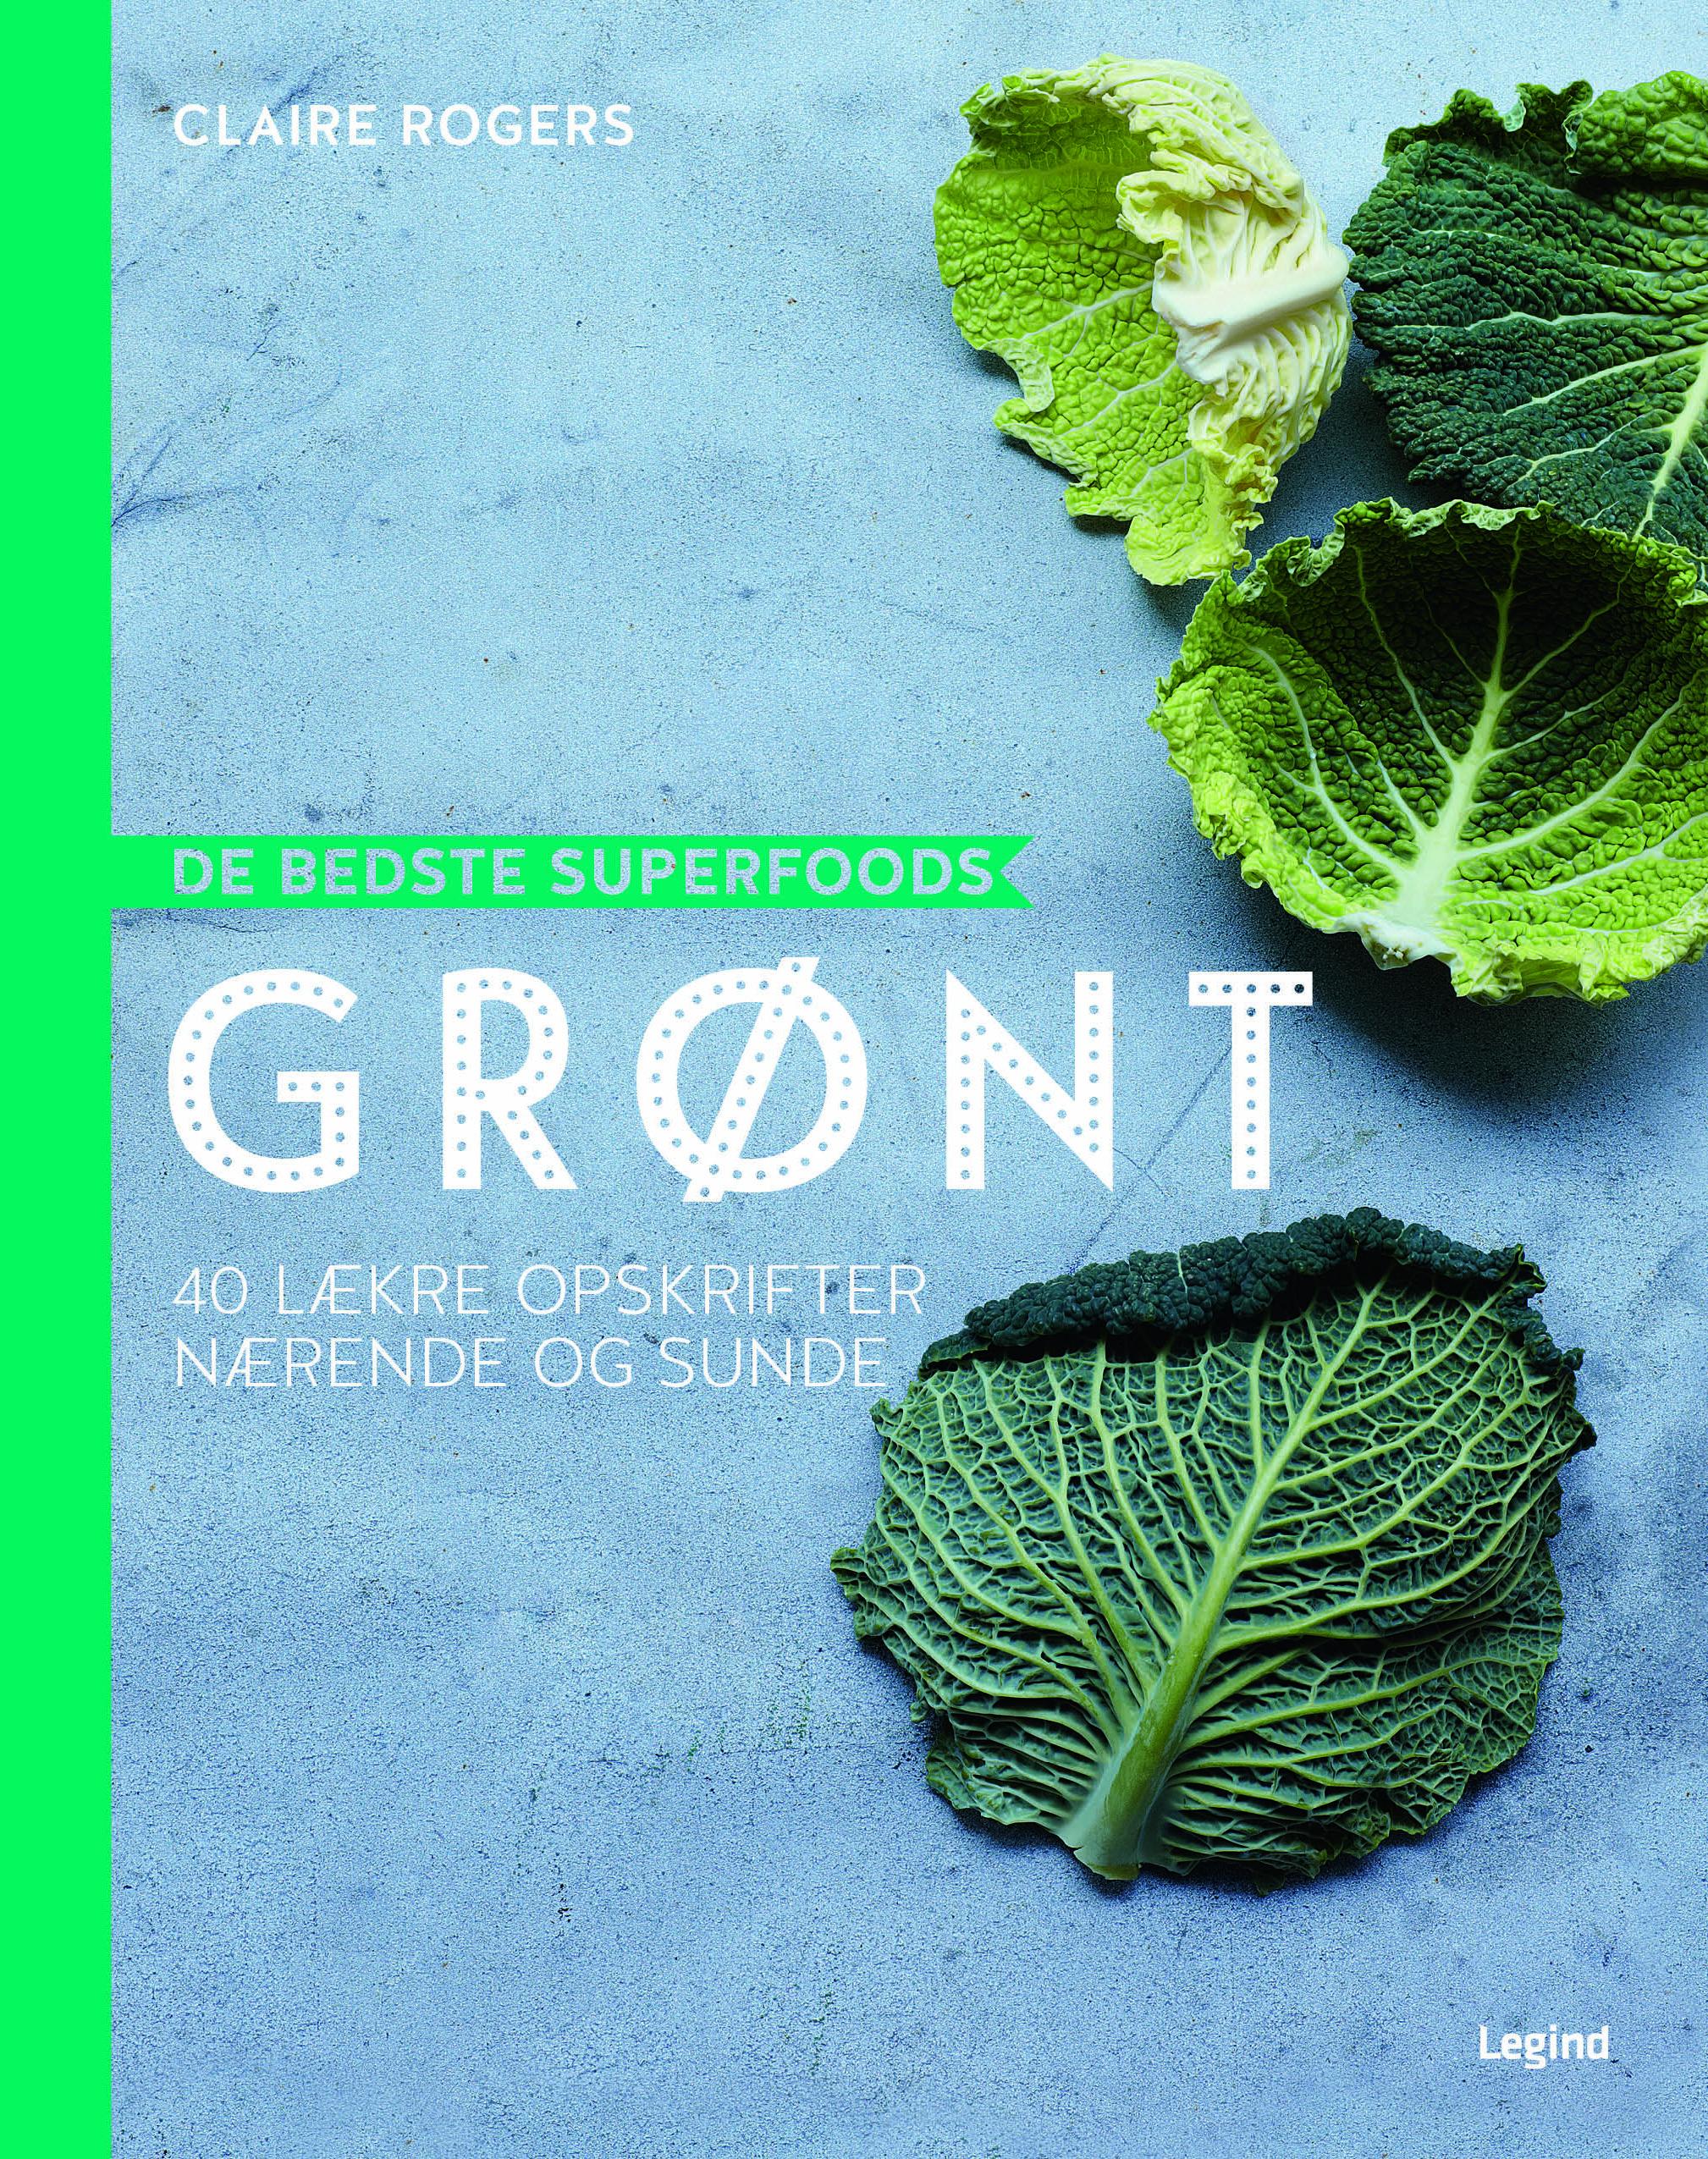 Grønt - Design by Martin Flink